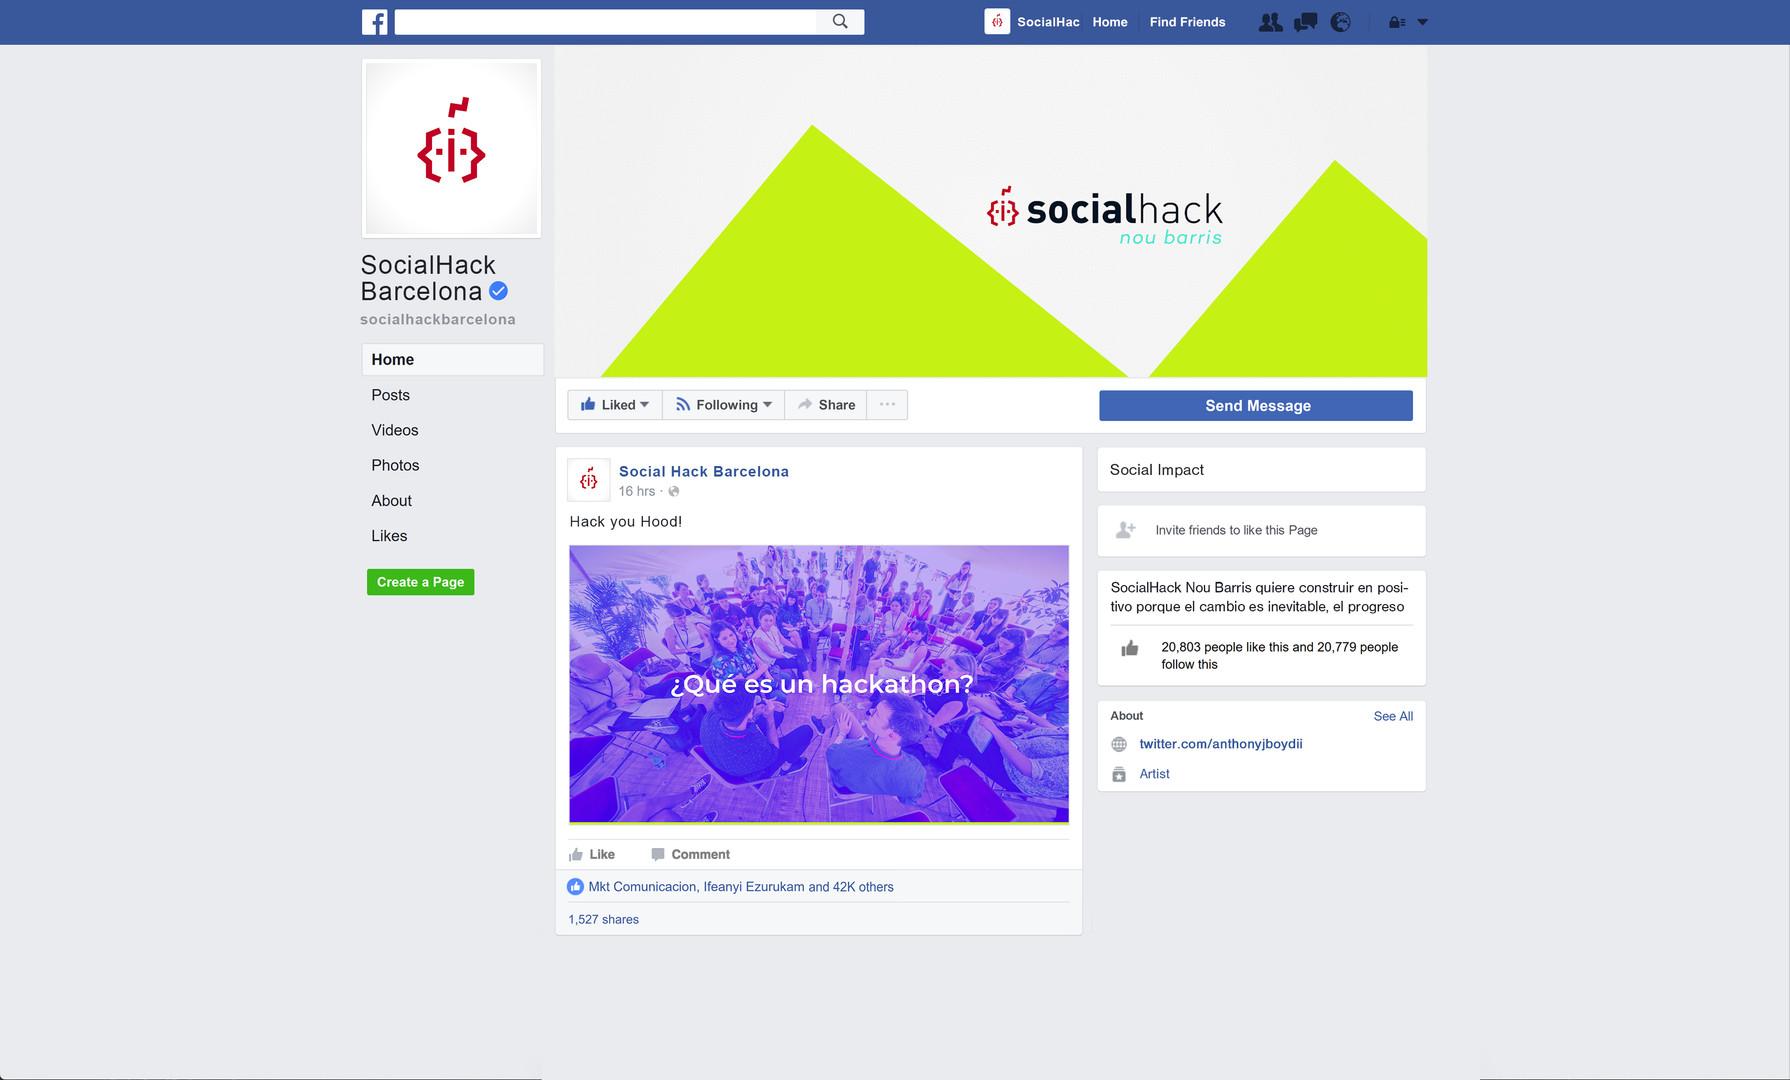 socialhackfacebookMockup.jpg